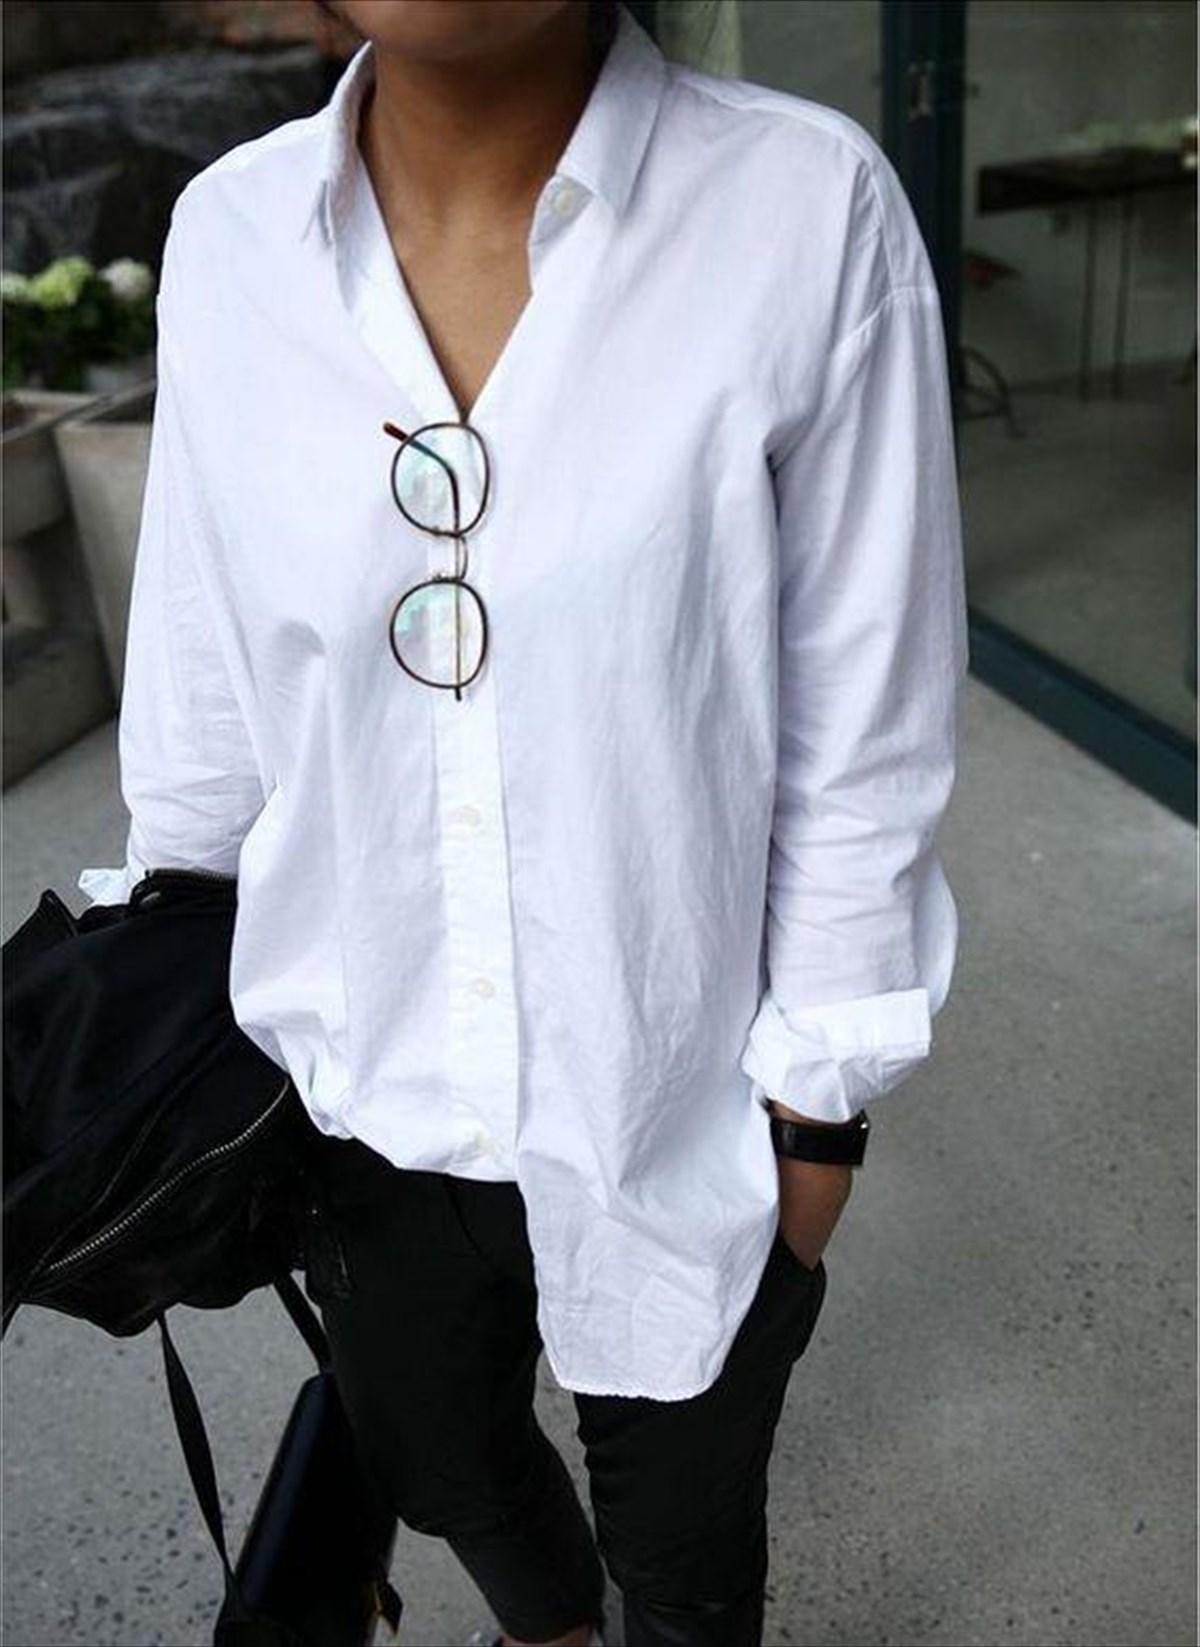 0ed813d8d51b ... δεν έχει ηλικία, μόλις το φορέσεις και στρώσεις το γιακά, βλέπεις  αυτομάτως πώς φωτίζεται το πρόσωπό σου. Η Cate Blanchett το προτιμά για όλες  τις ...